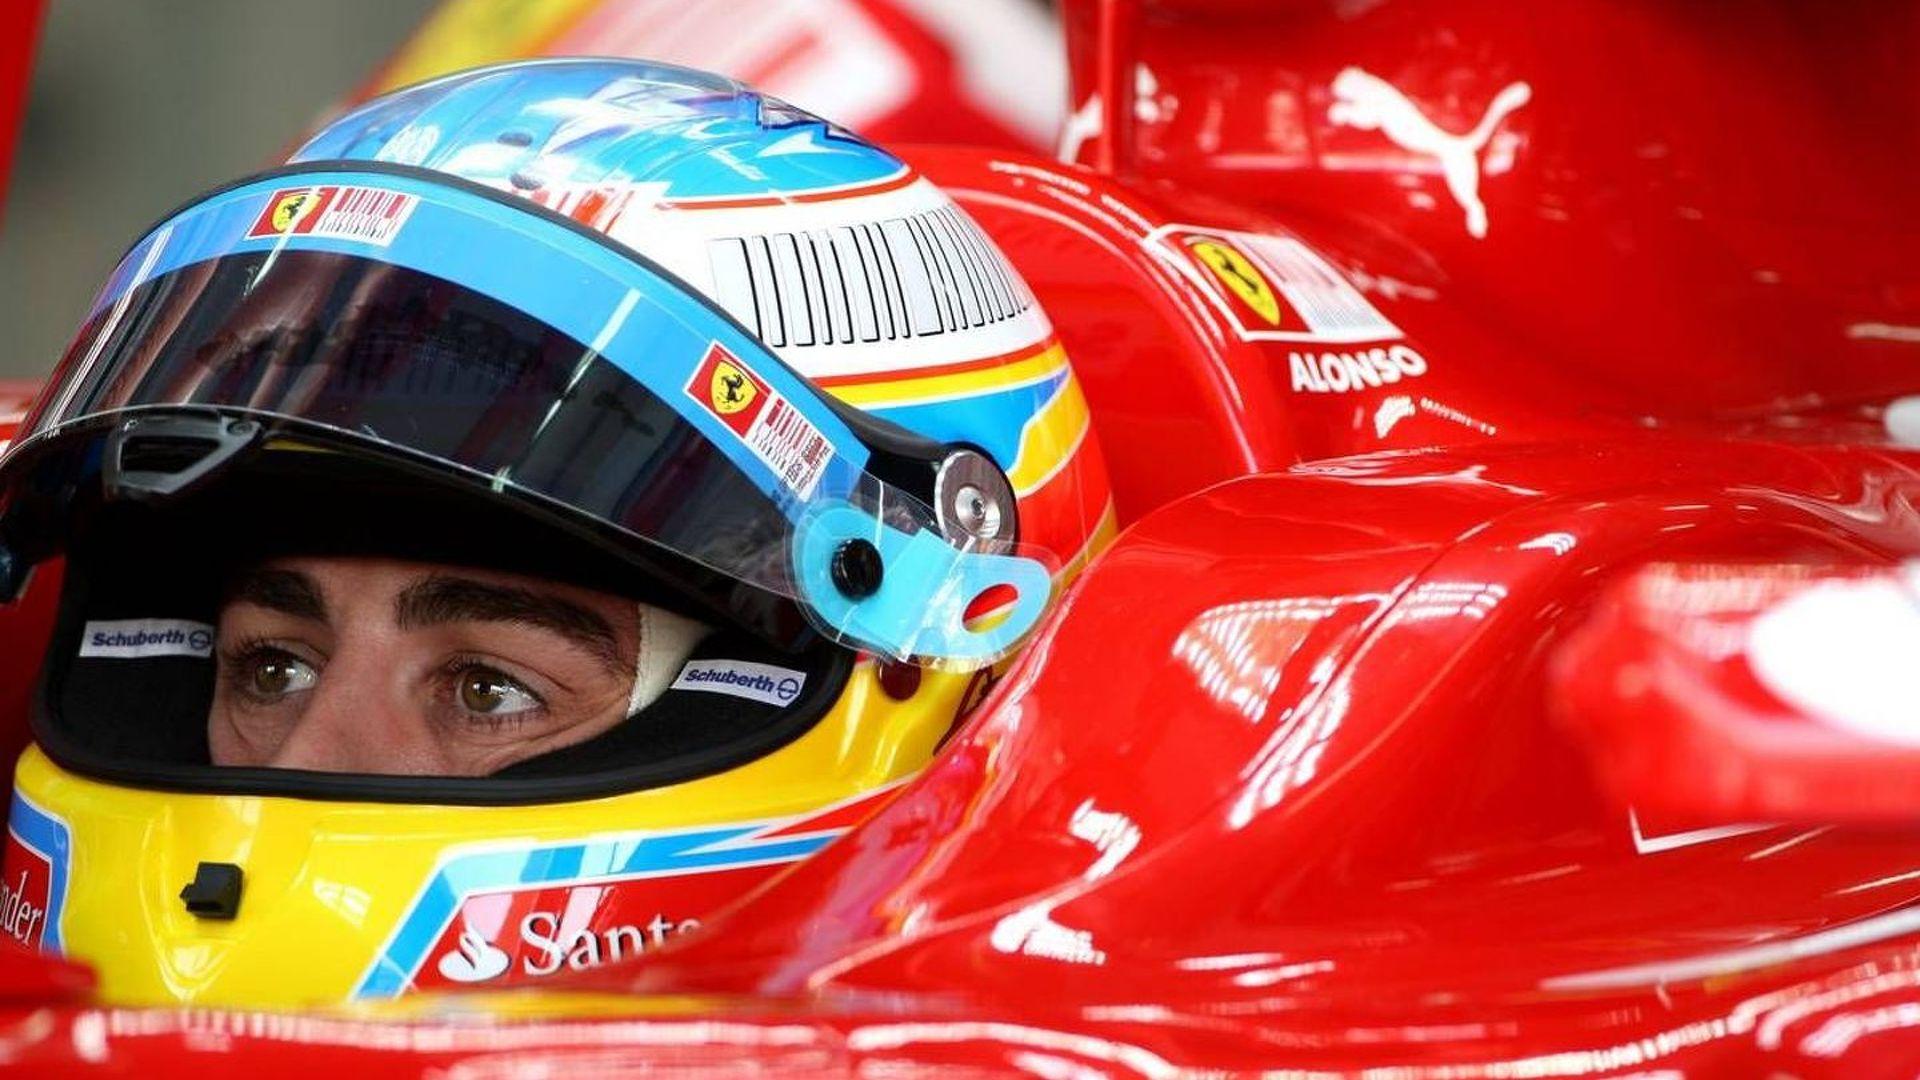 Ferrari also changes Alonso's engine